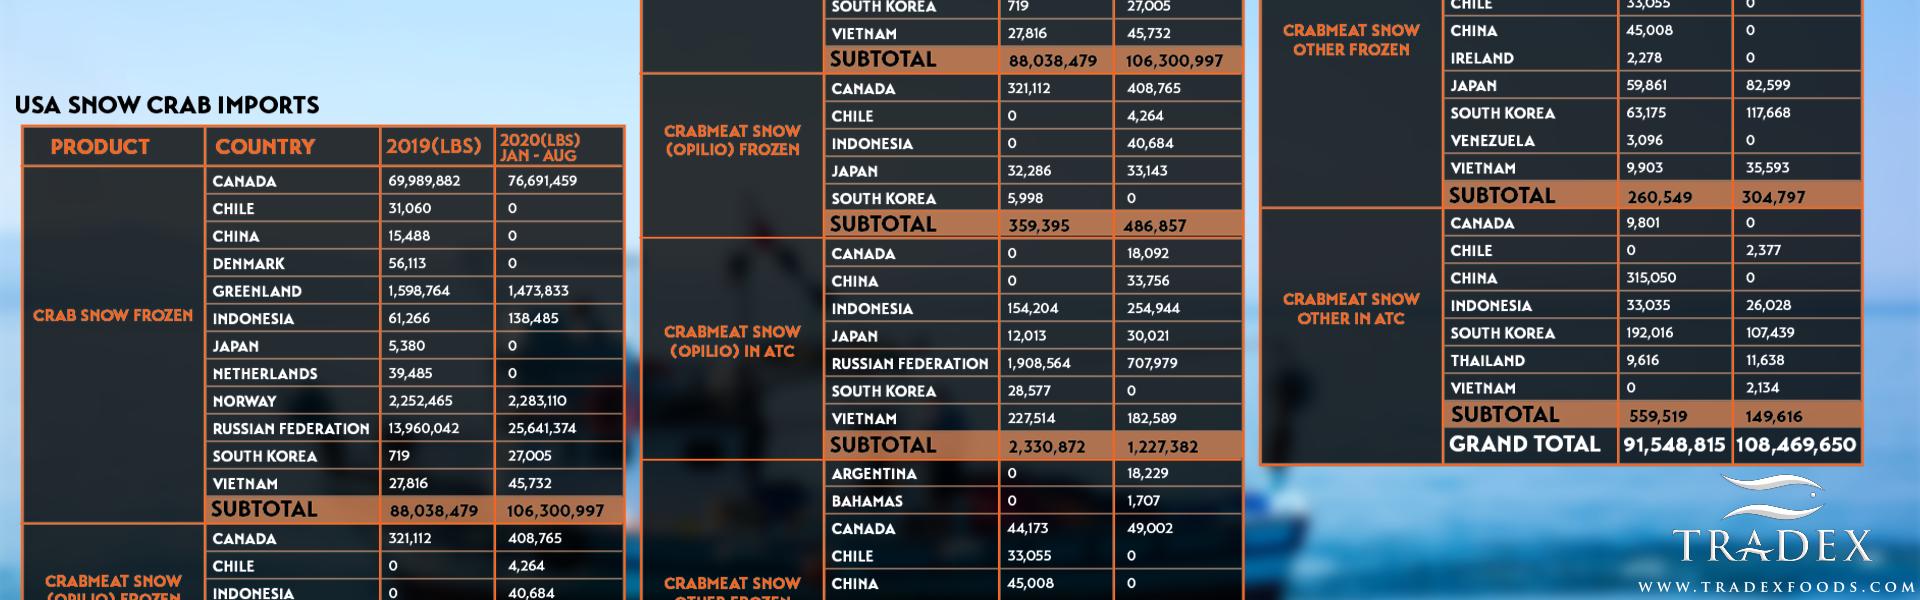 USA Snow Crab 2020 Imports